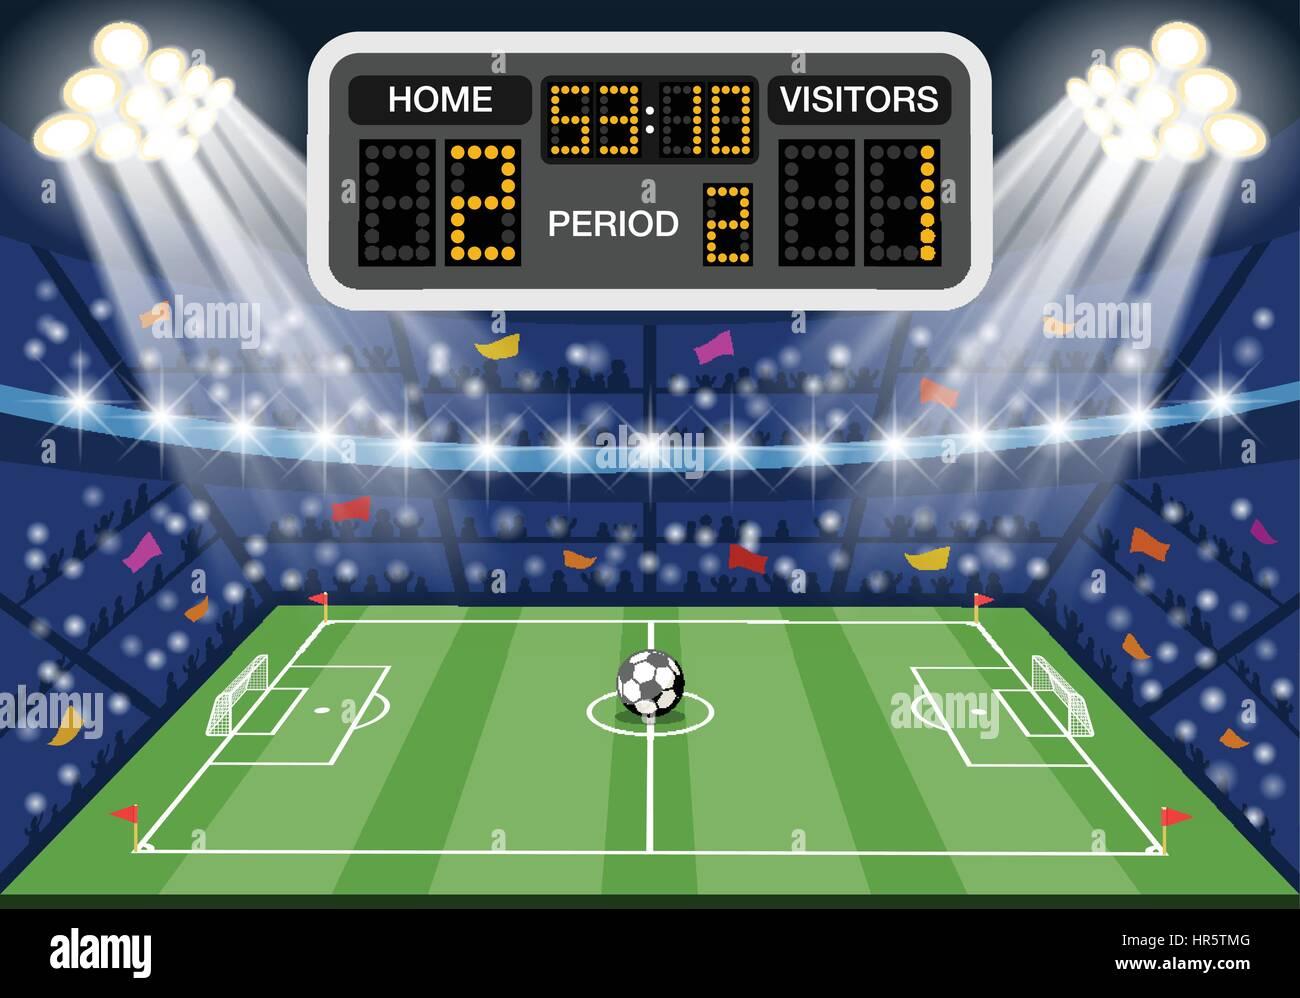 Soccer stadium with scoreboard - Stock Vector